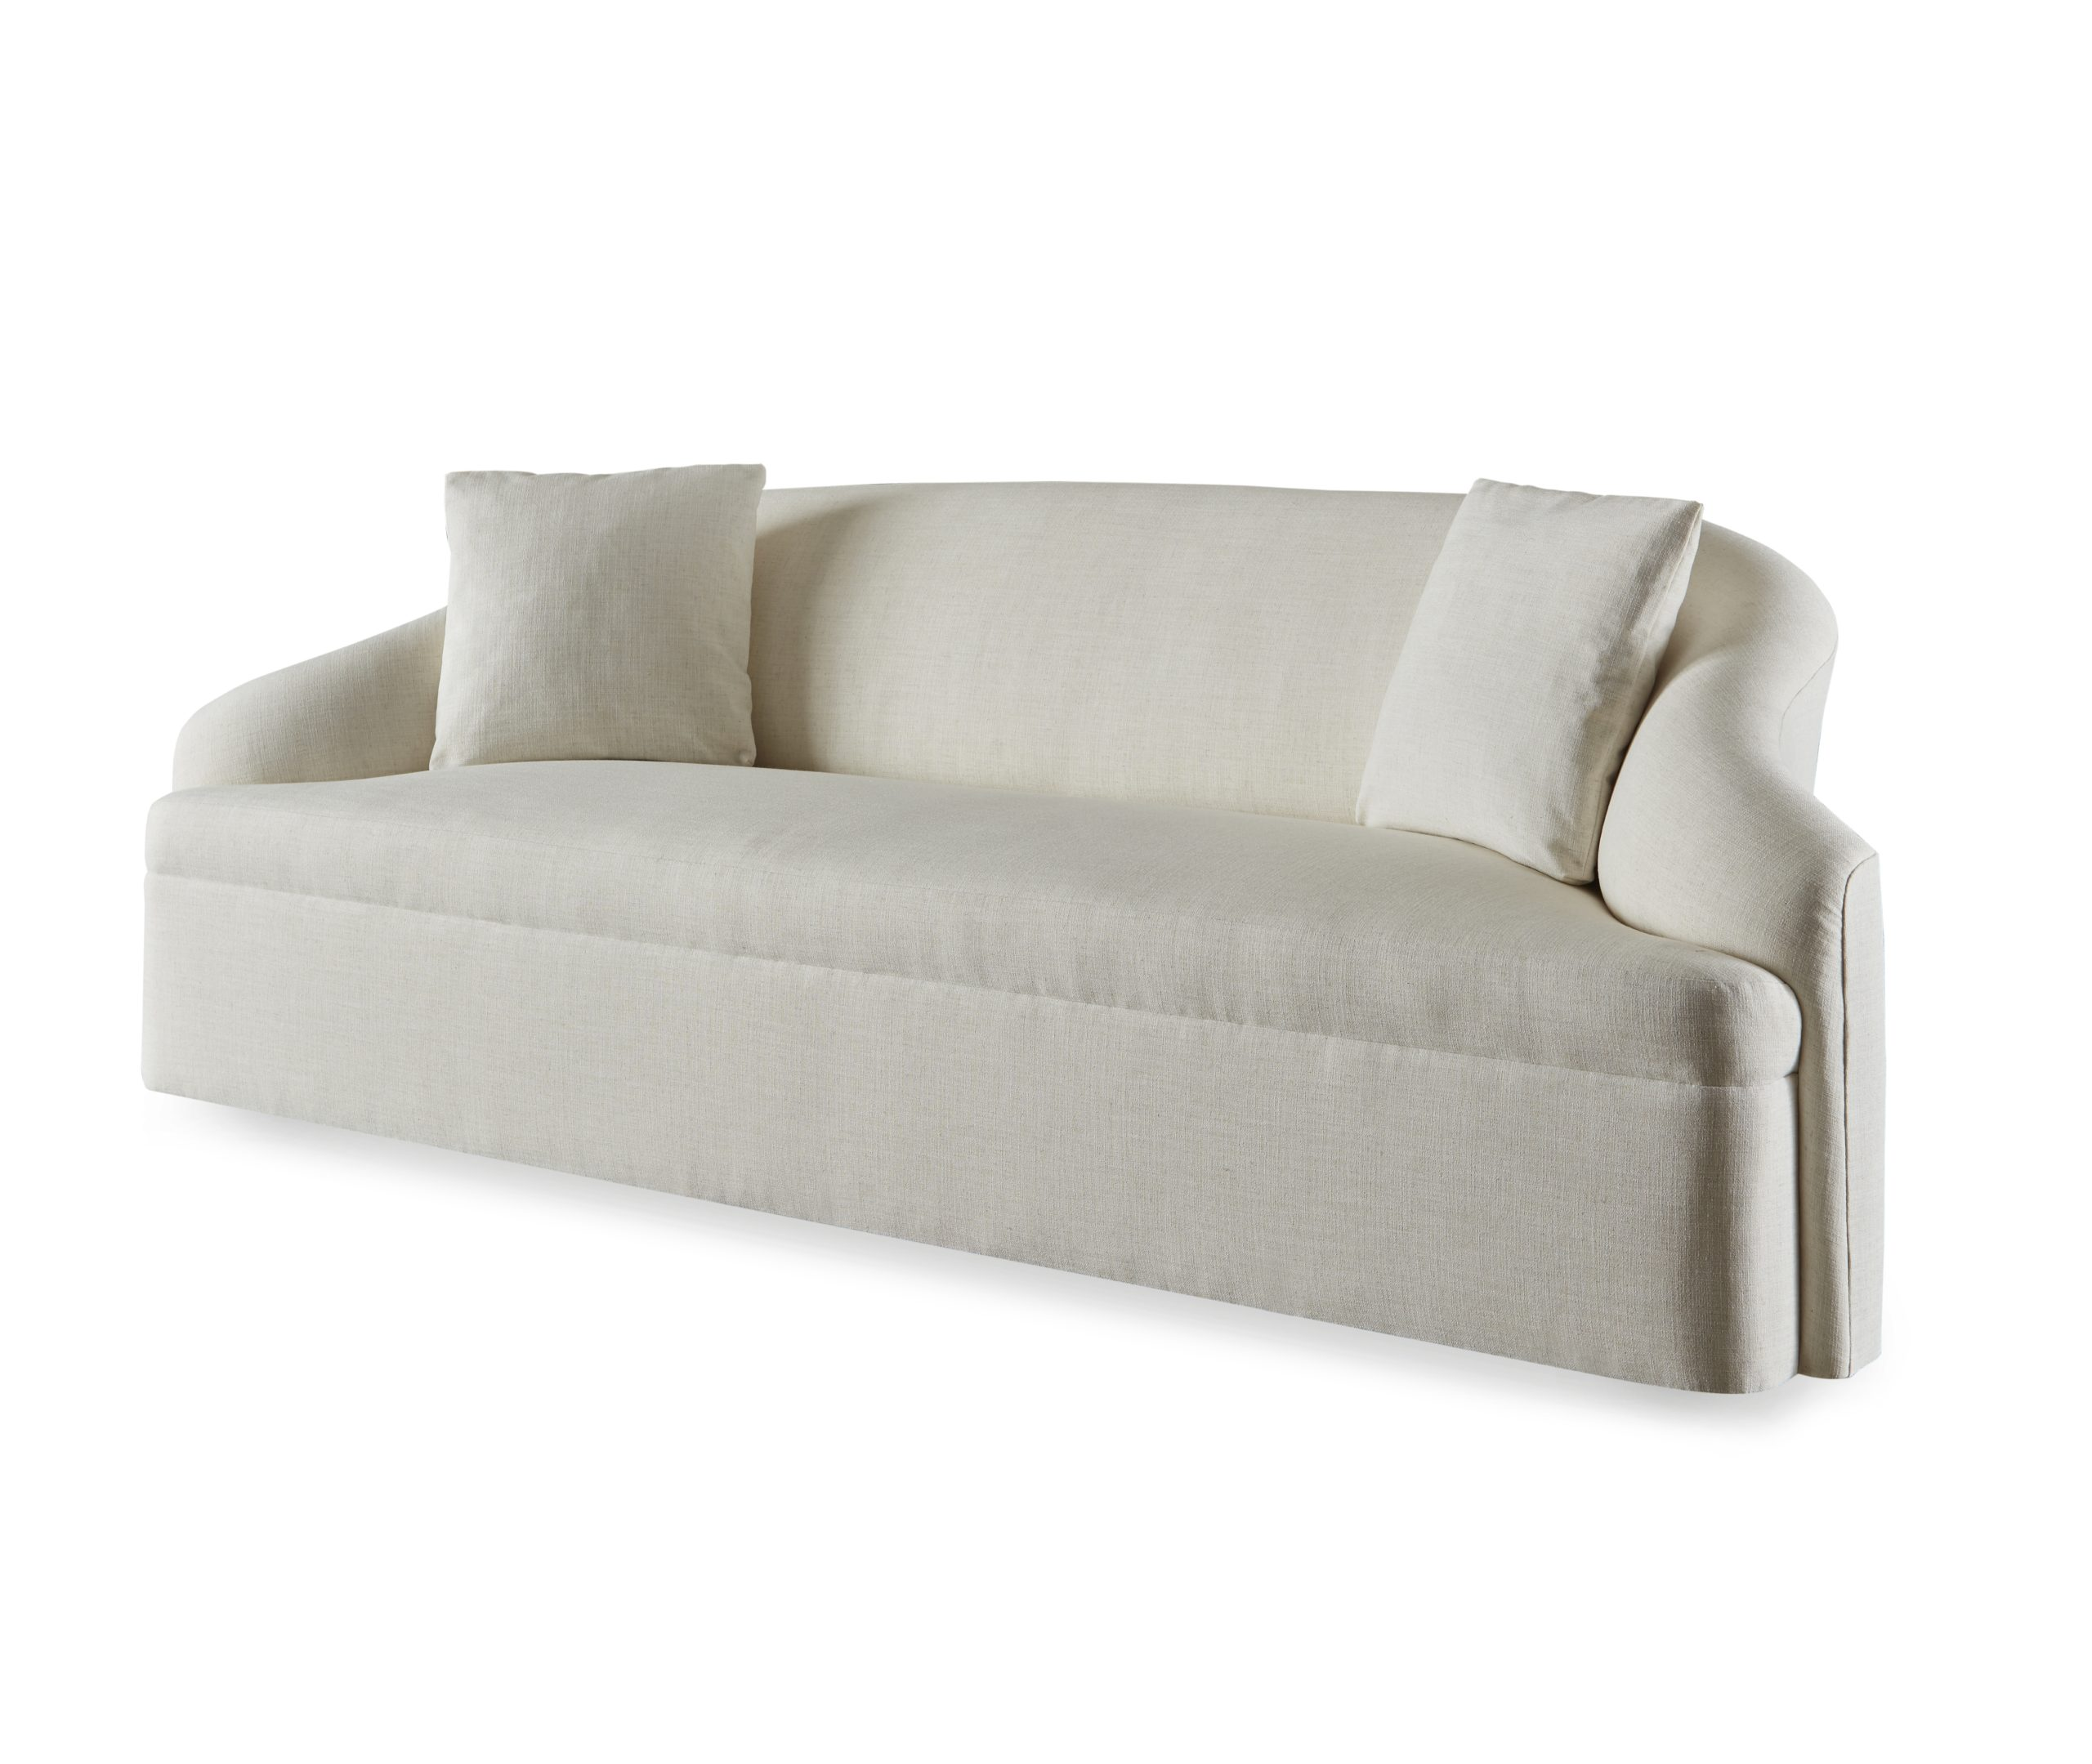 Baker_products_WNWN_skylar_sofa_BAU3304s_FRONT_3QRT-scaled-1